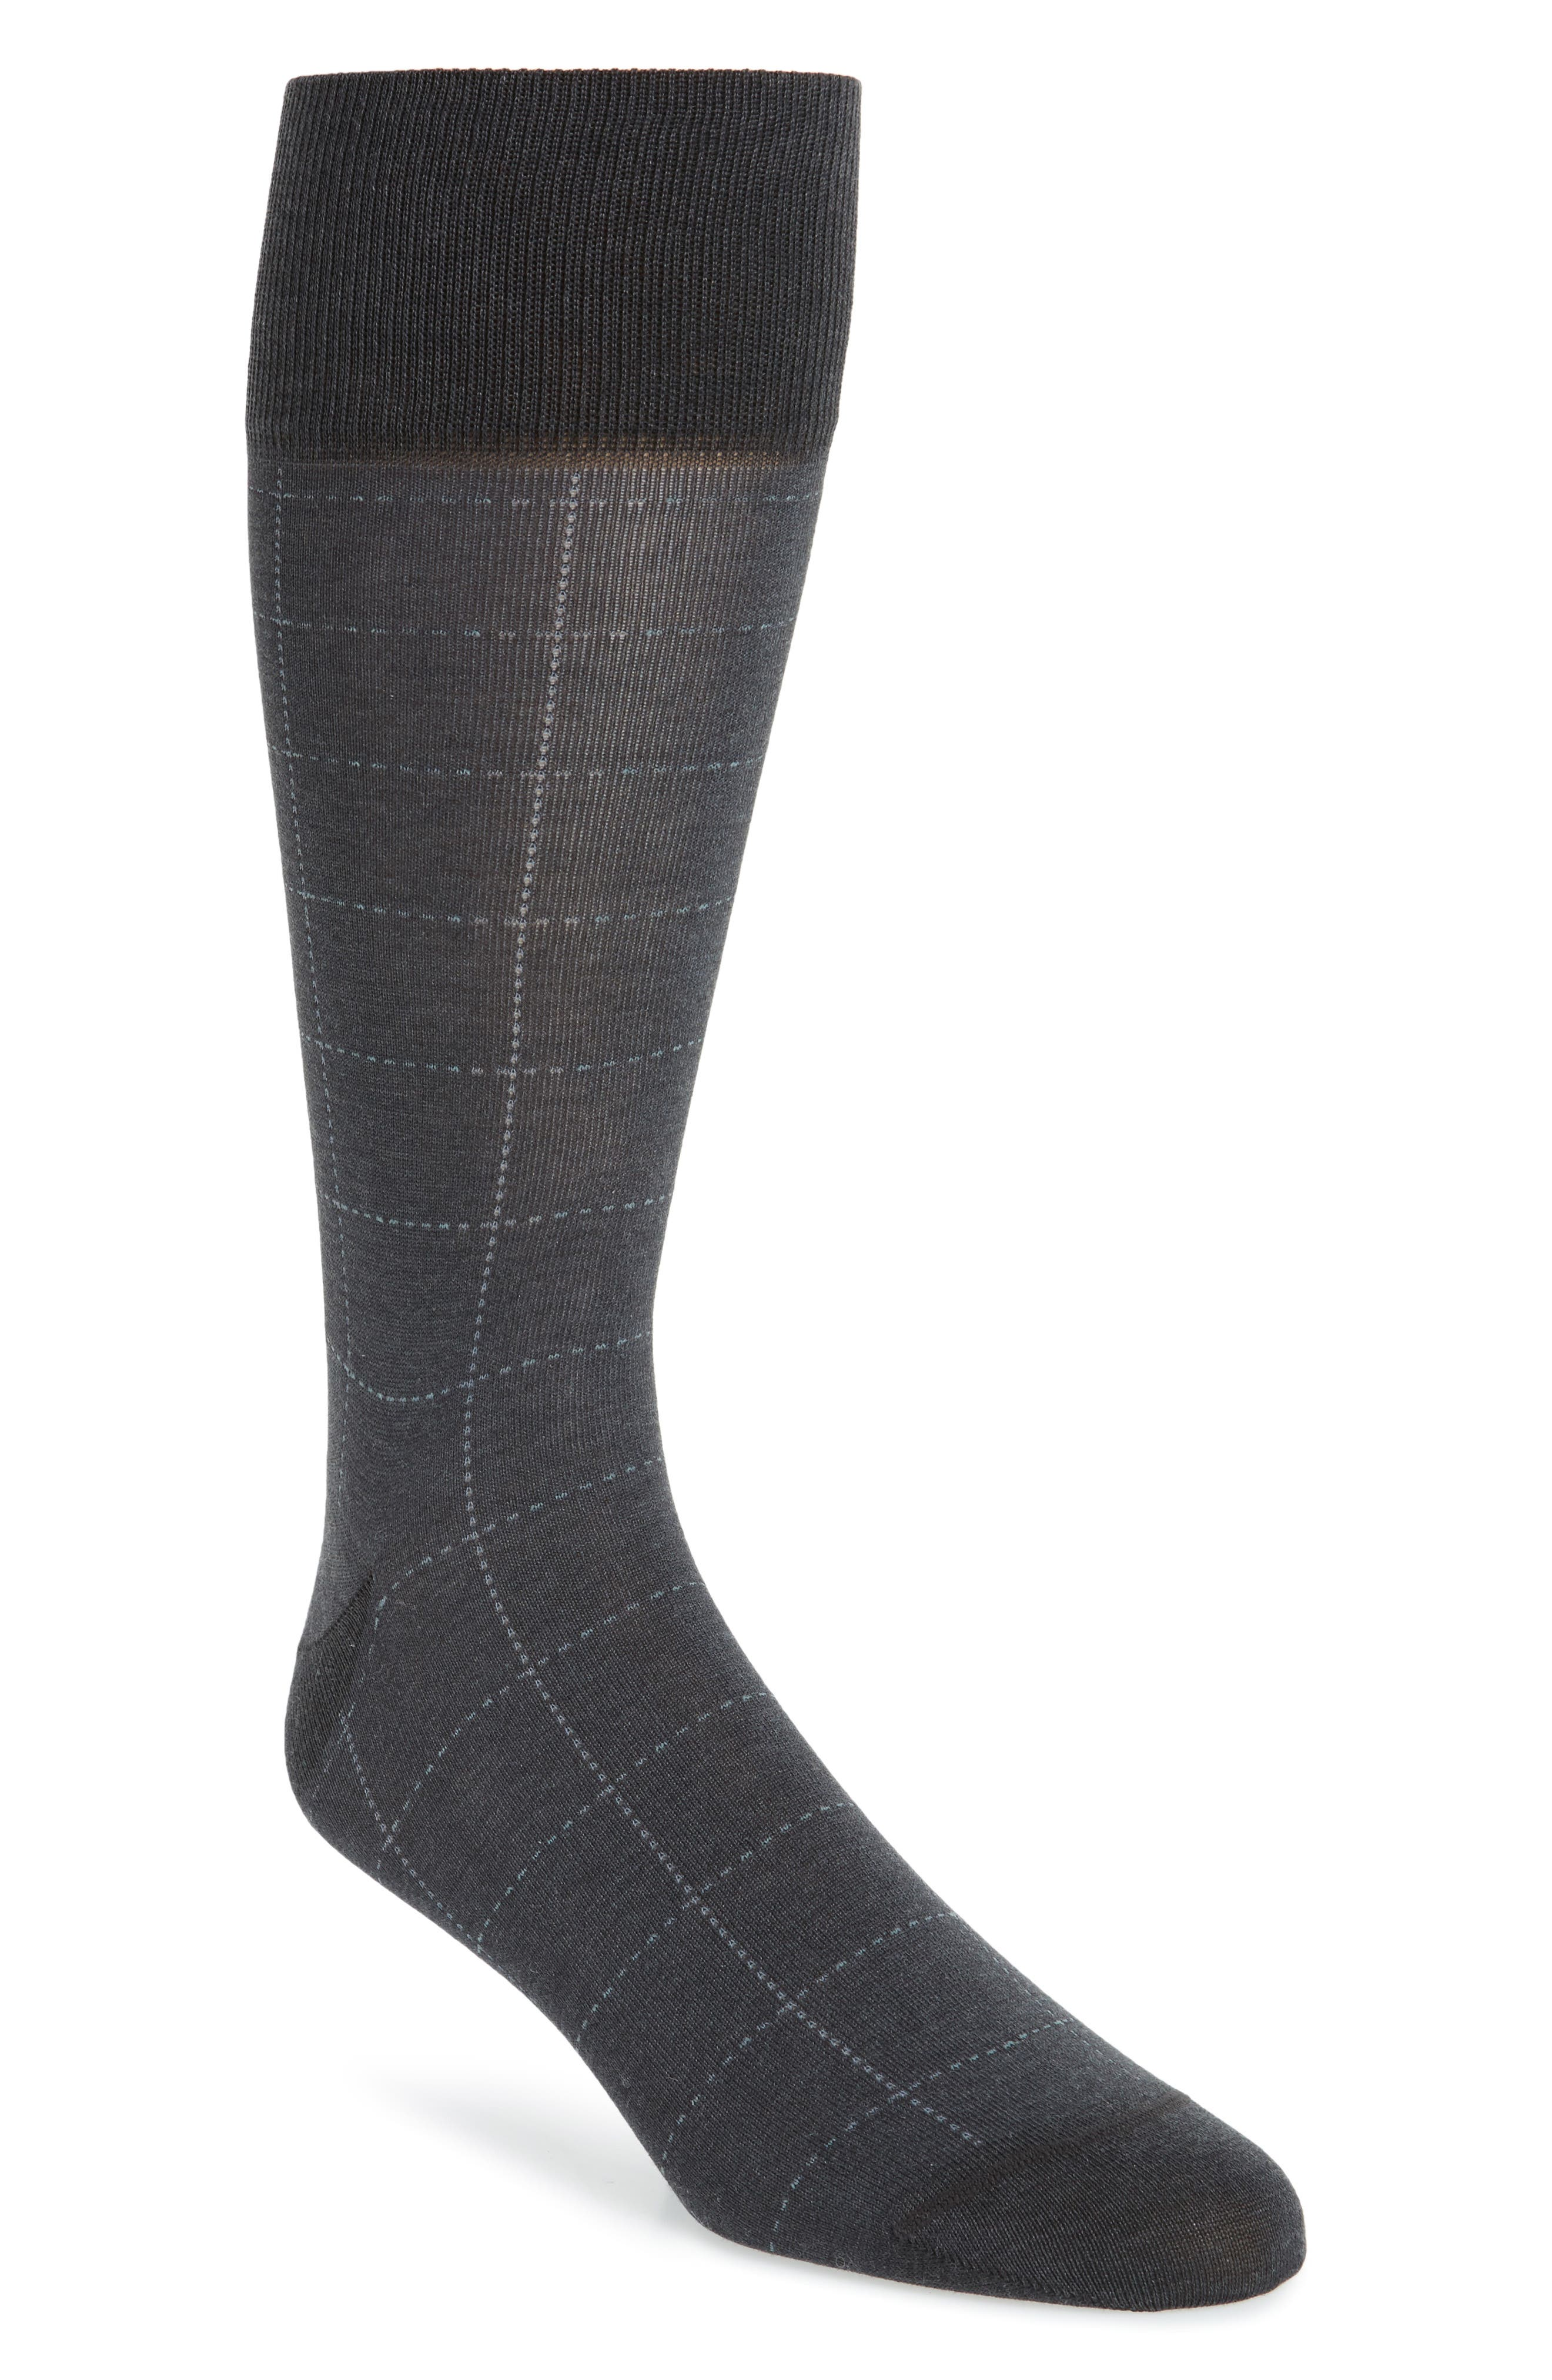 Broken Grid Socks,                         Main,                         color, Charcoal Heather